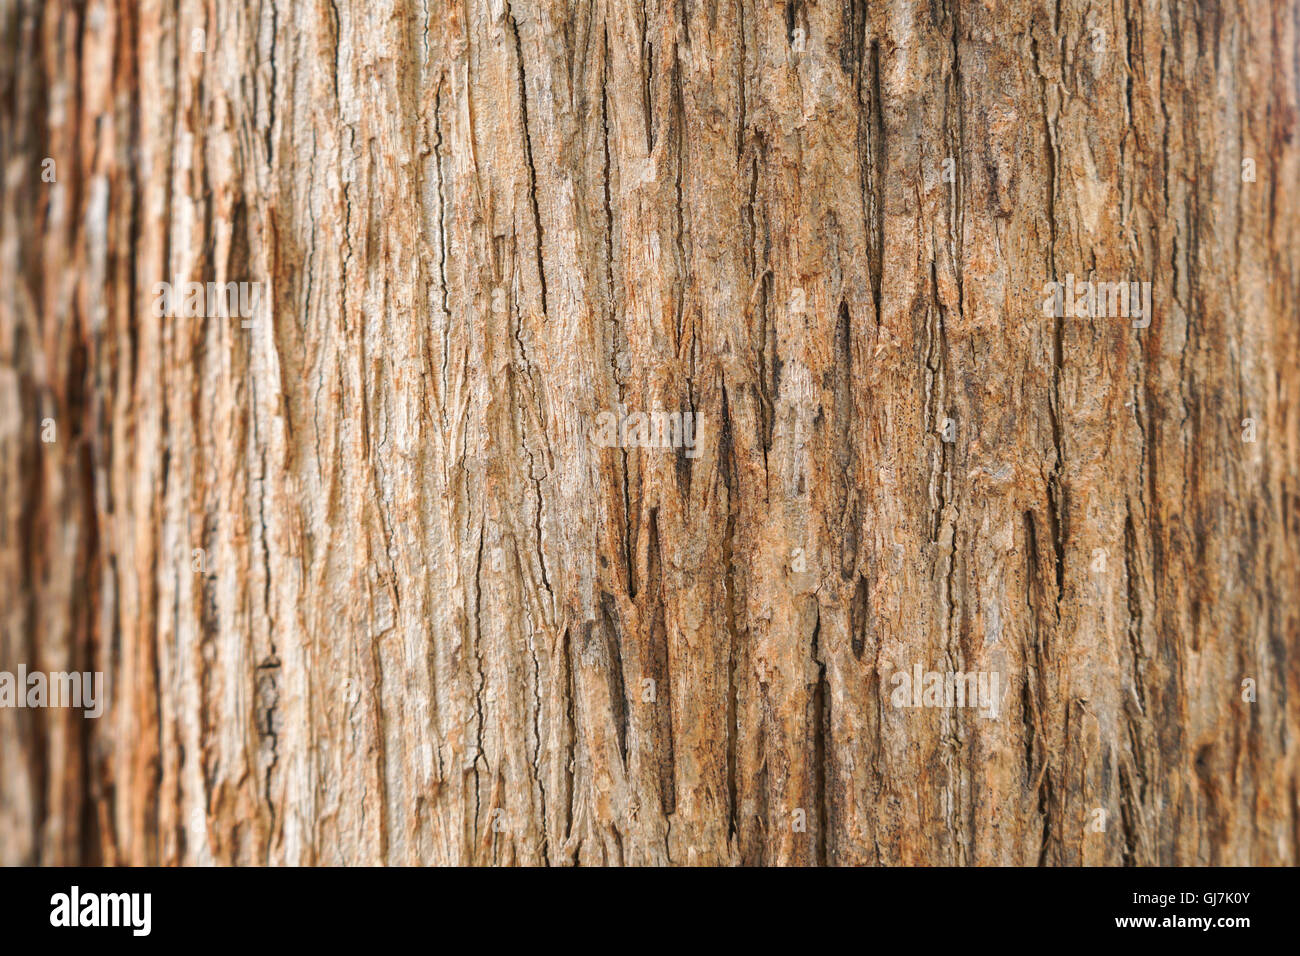 Teakbaum rinde  Teak-Baum Rinde Textur Stockfoto, Bild: 114494603 - Alamy